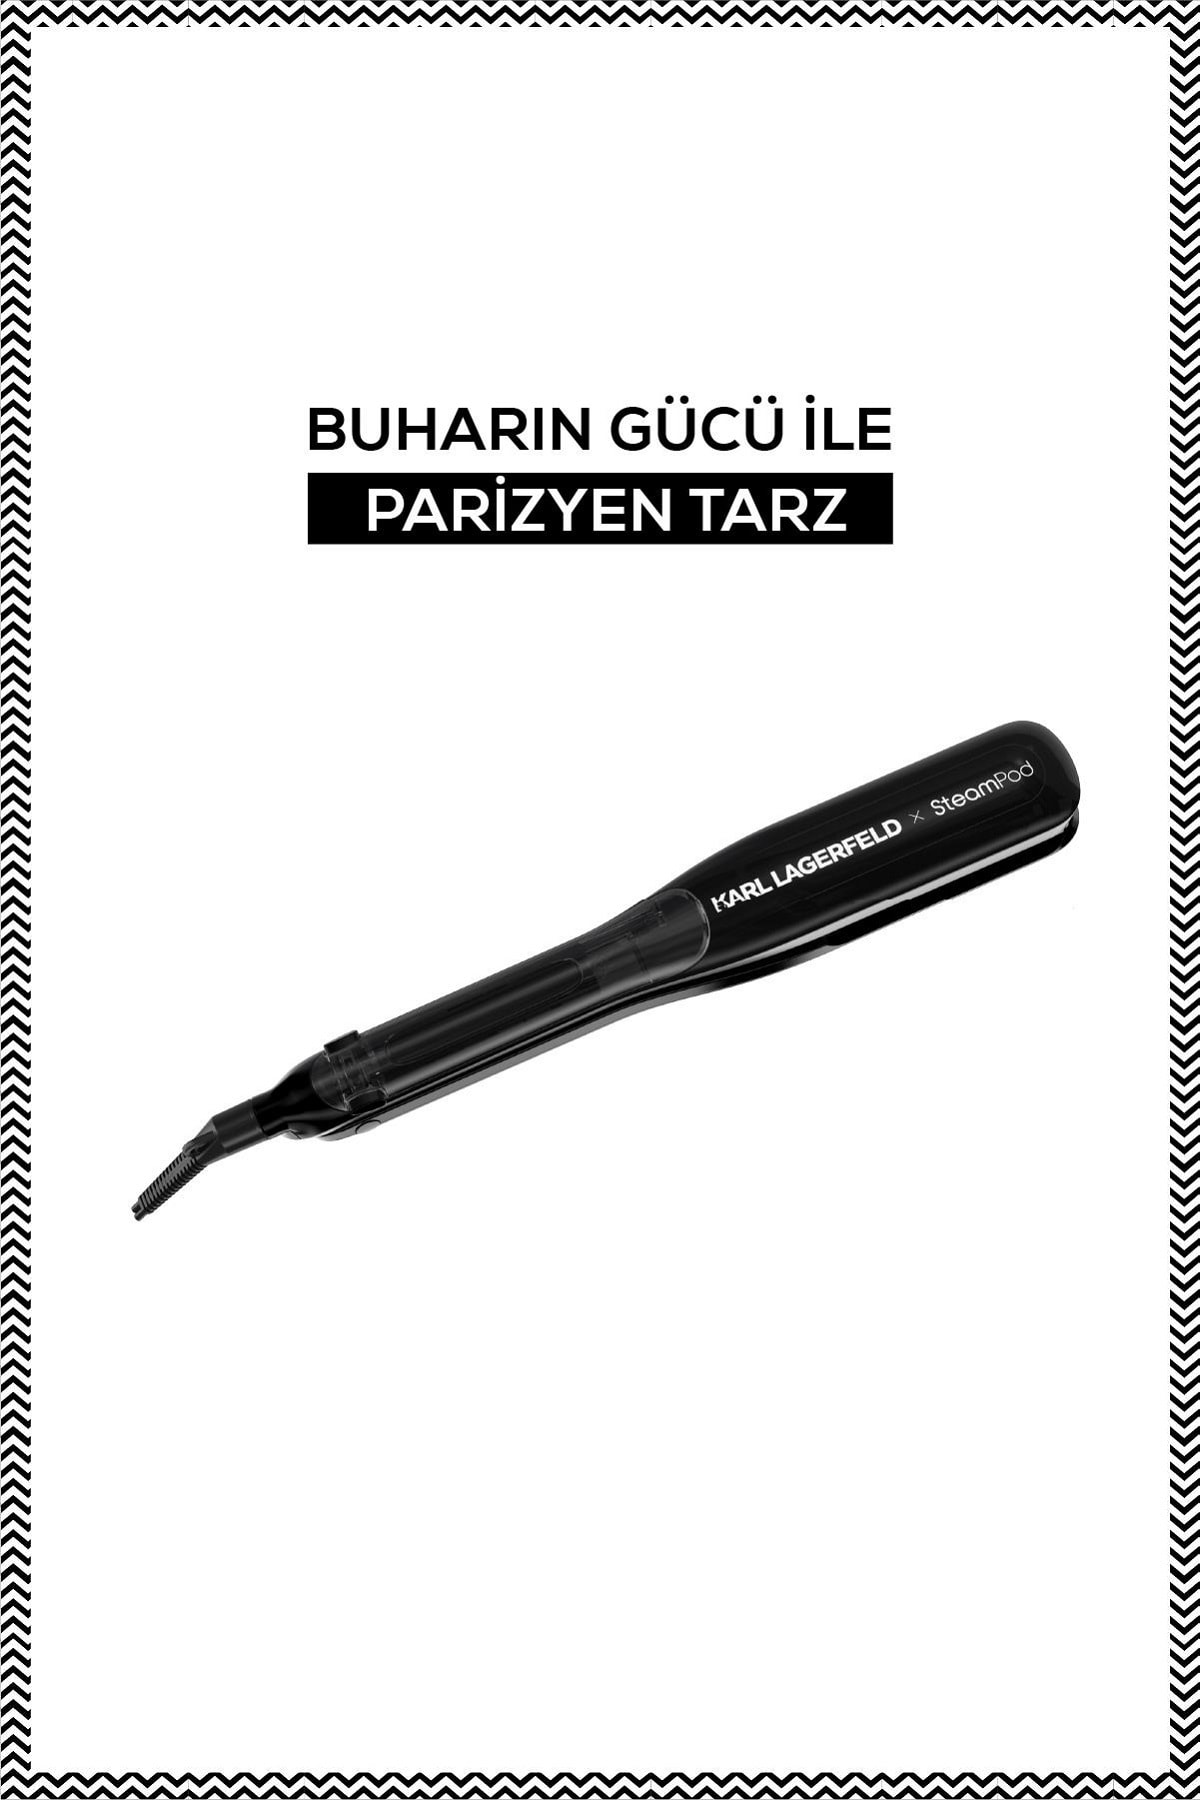 Steampod X Karl Lagerfeld 3.0 Limited Edition Buharlı Saç Şekillendiricisi